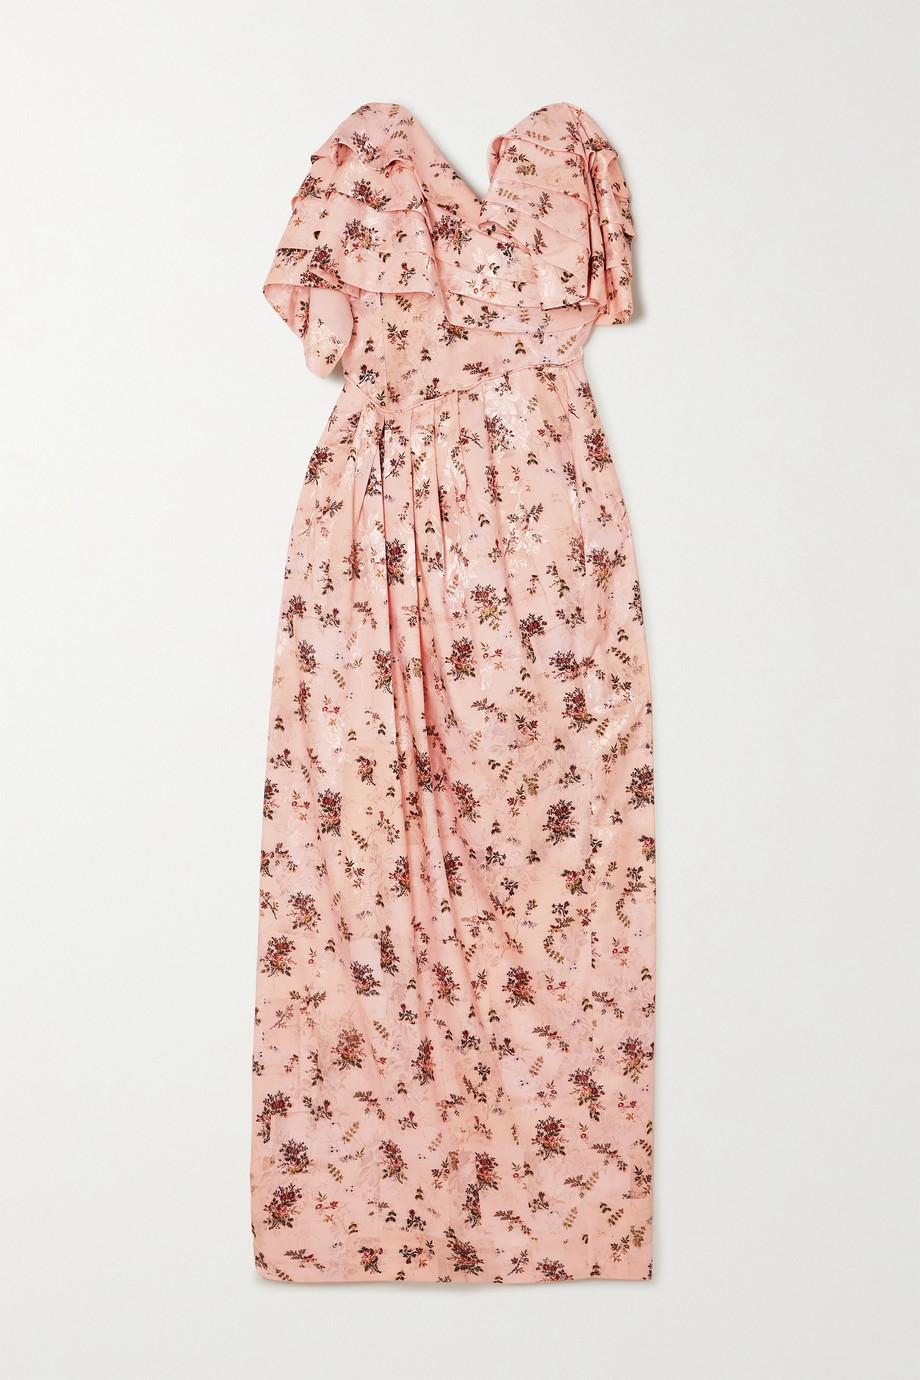 Preen by Thornton Bregazzi Novella strapless ruffled floral-print satin-jacquard dress